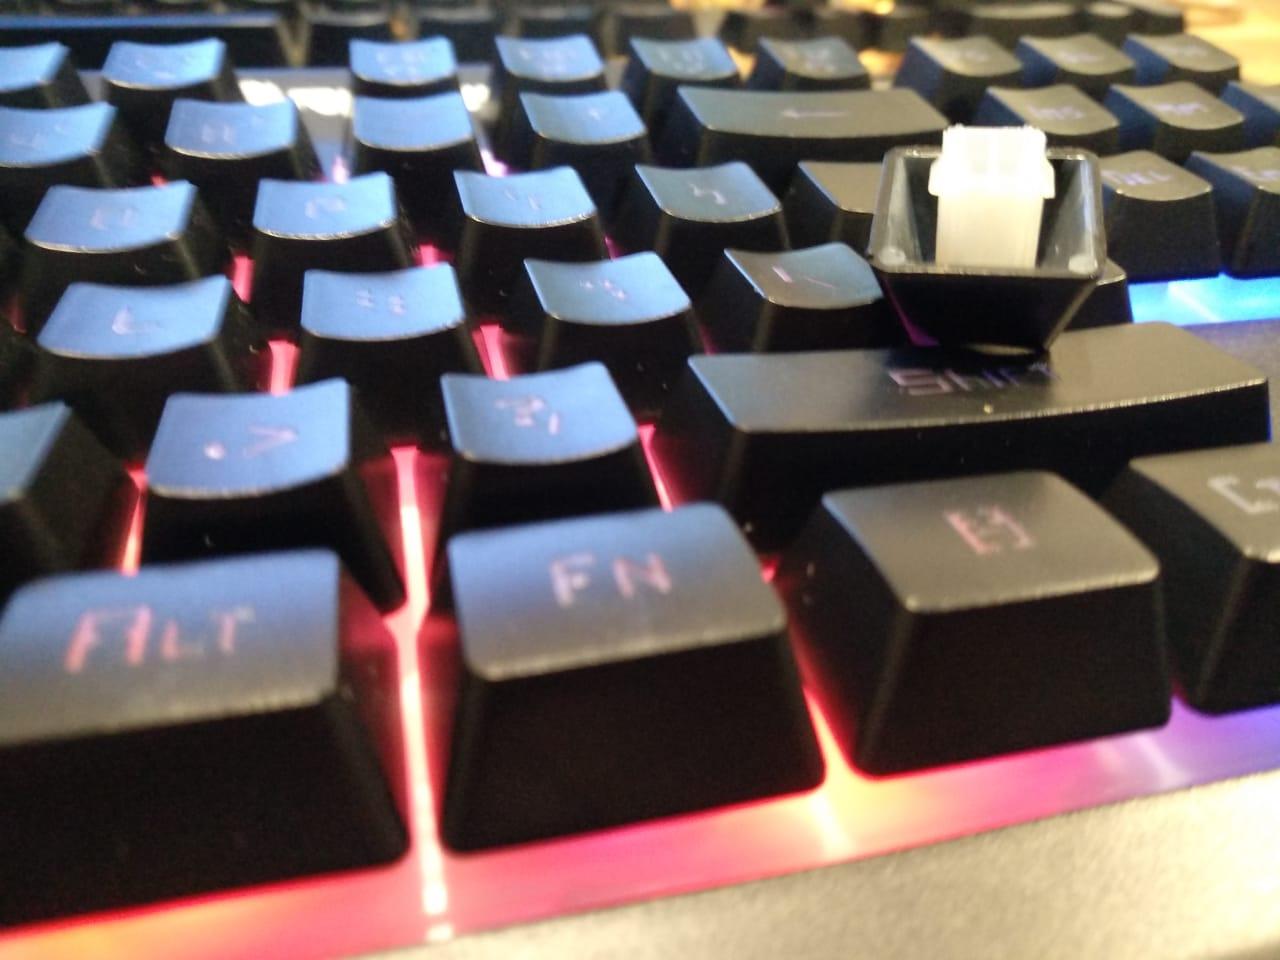 keyboard gaming rexus k9d kini dilengkapi tombol berteknologi double shot injection Keyboard Gaming Rexus K9D Kini Dilengkapi Tombol Berteknologi Double Shot Injection WhatsApp Image 2018 08 01 at 15